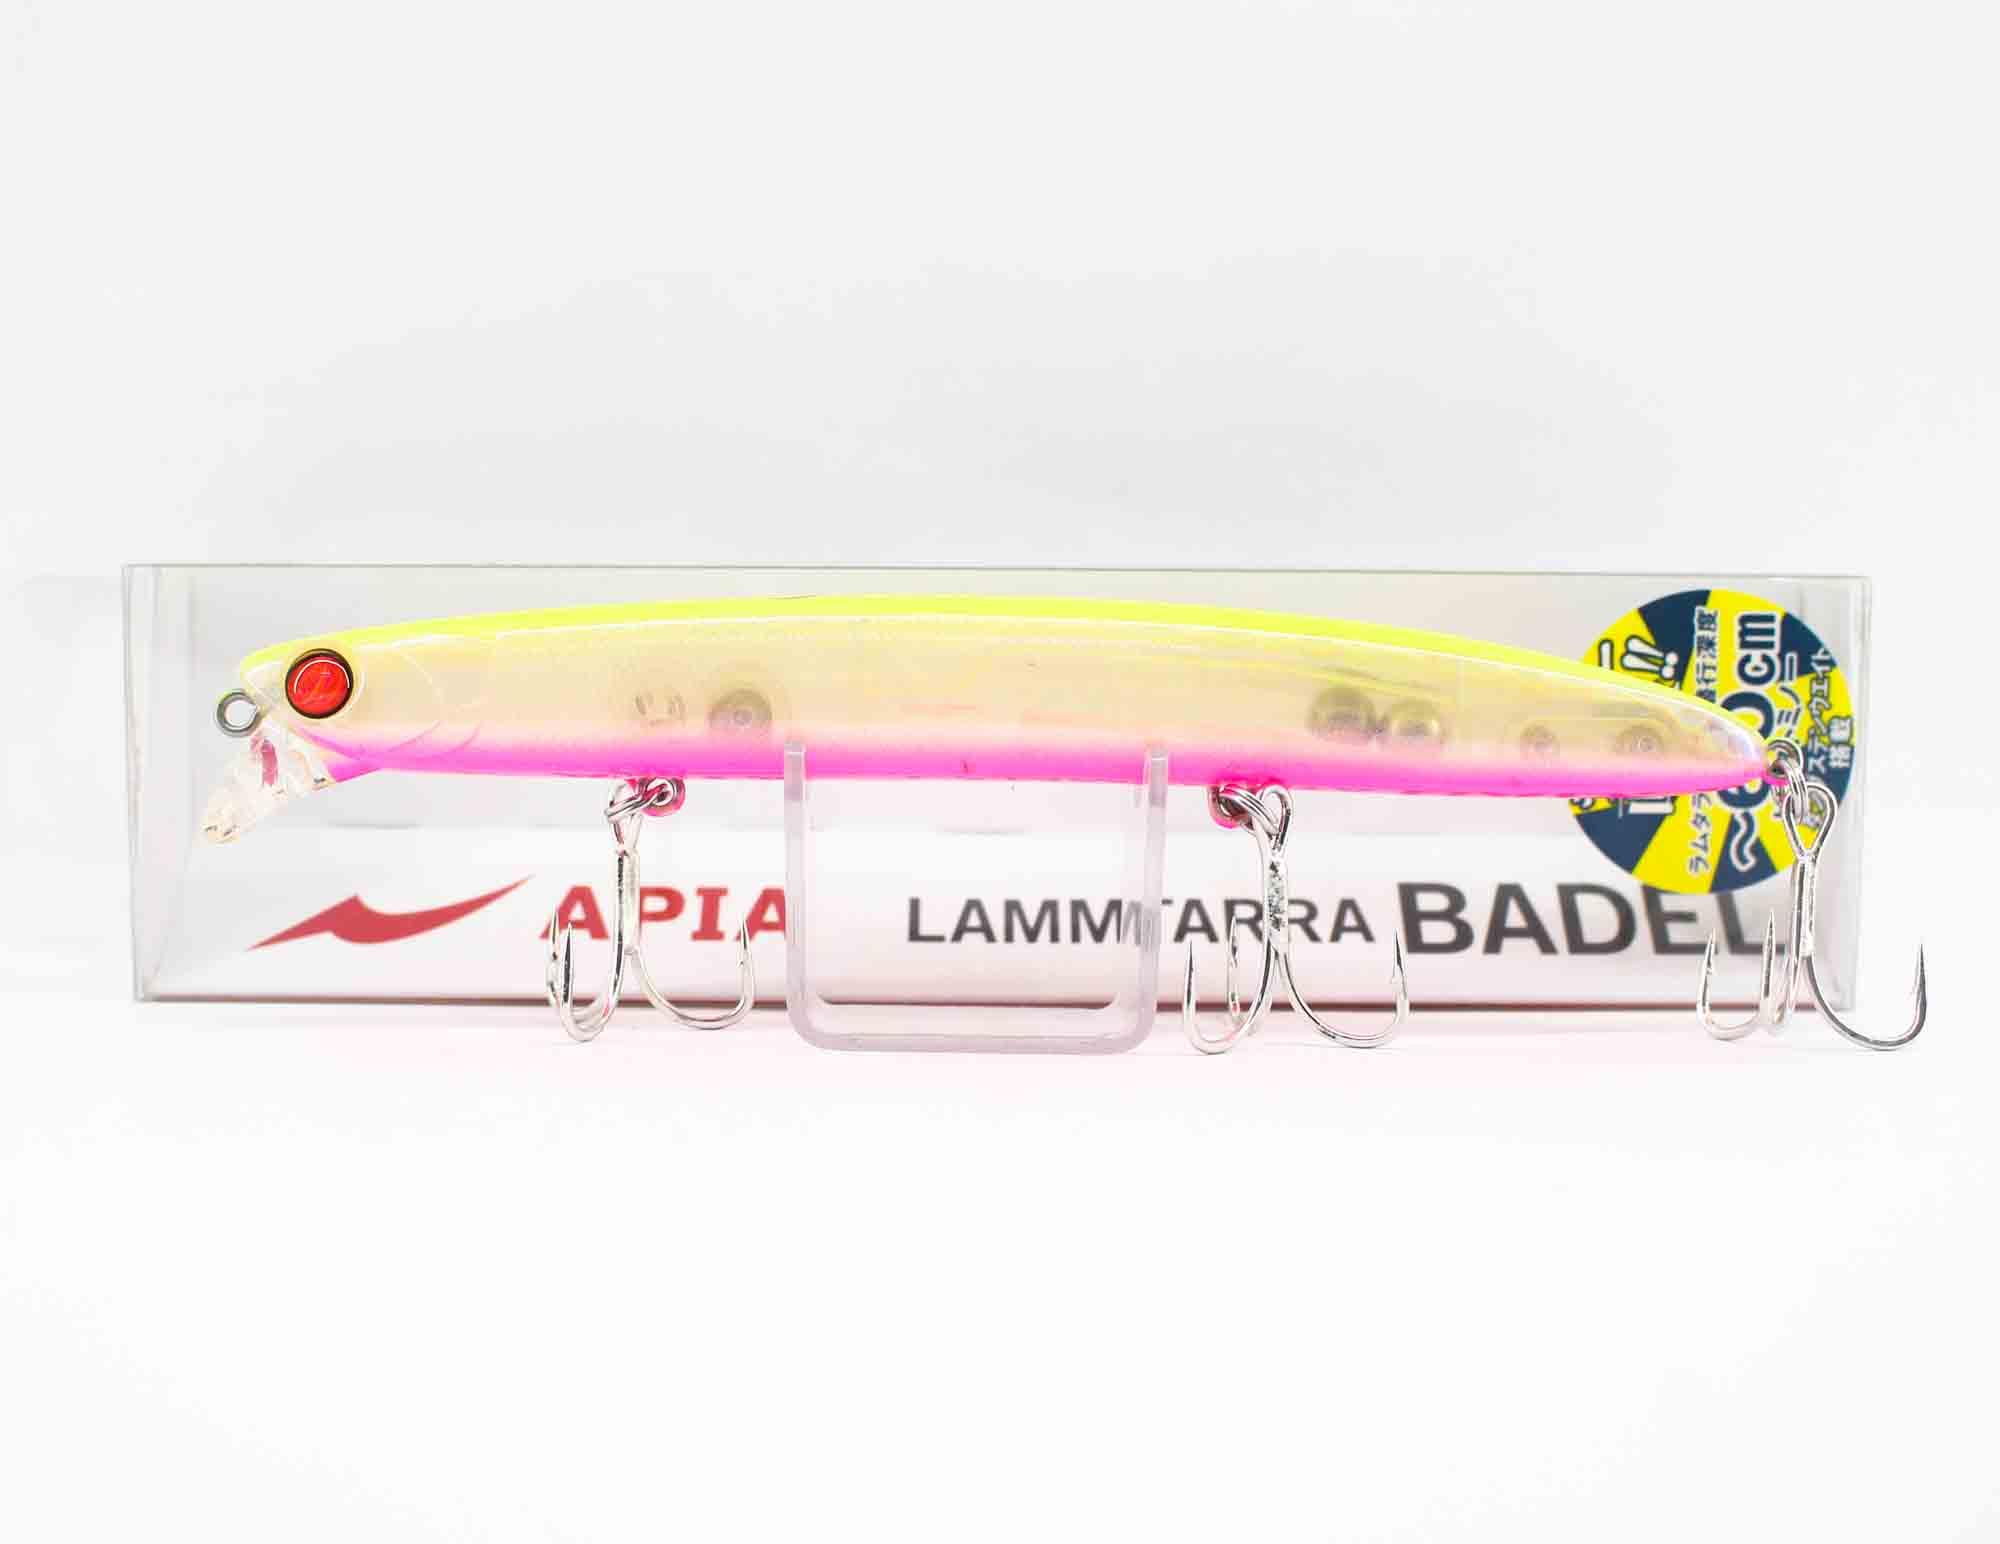 Apia Lammtarra Badel Suspend Lure 03 (5480)